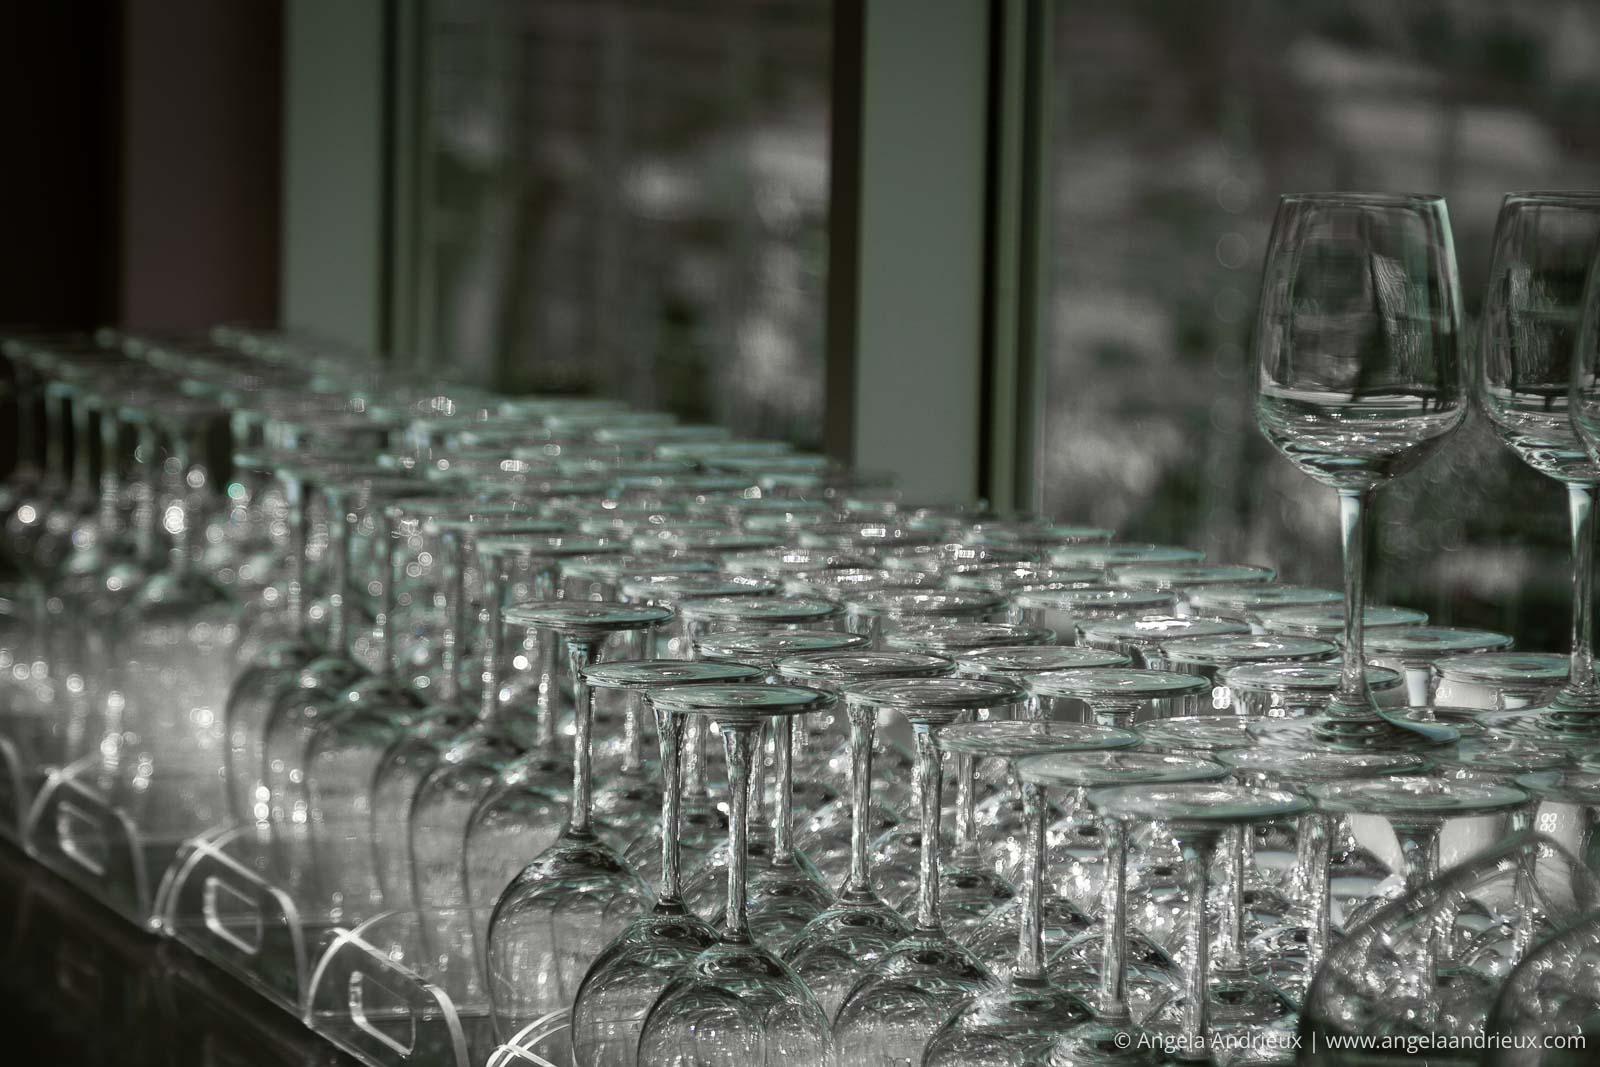 A multitude of wine glasses